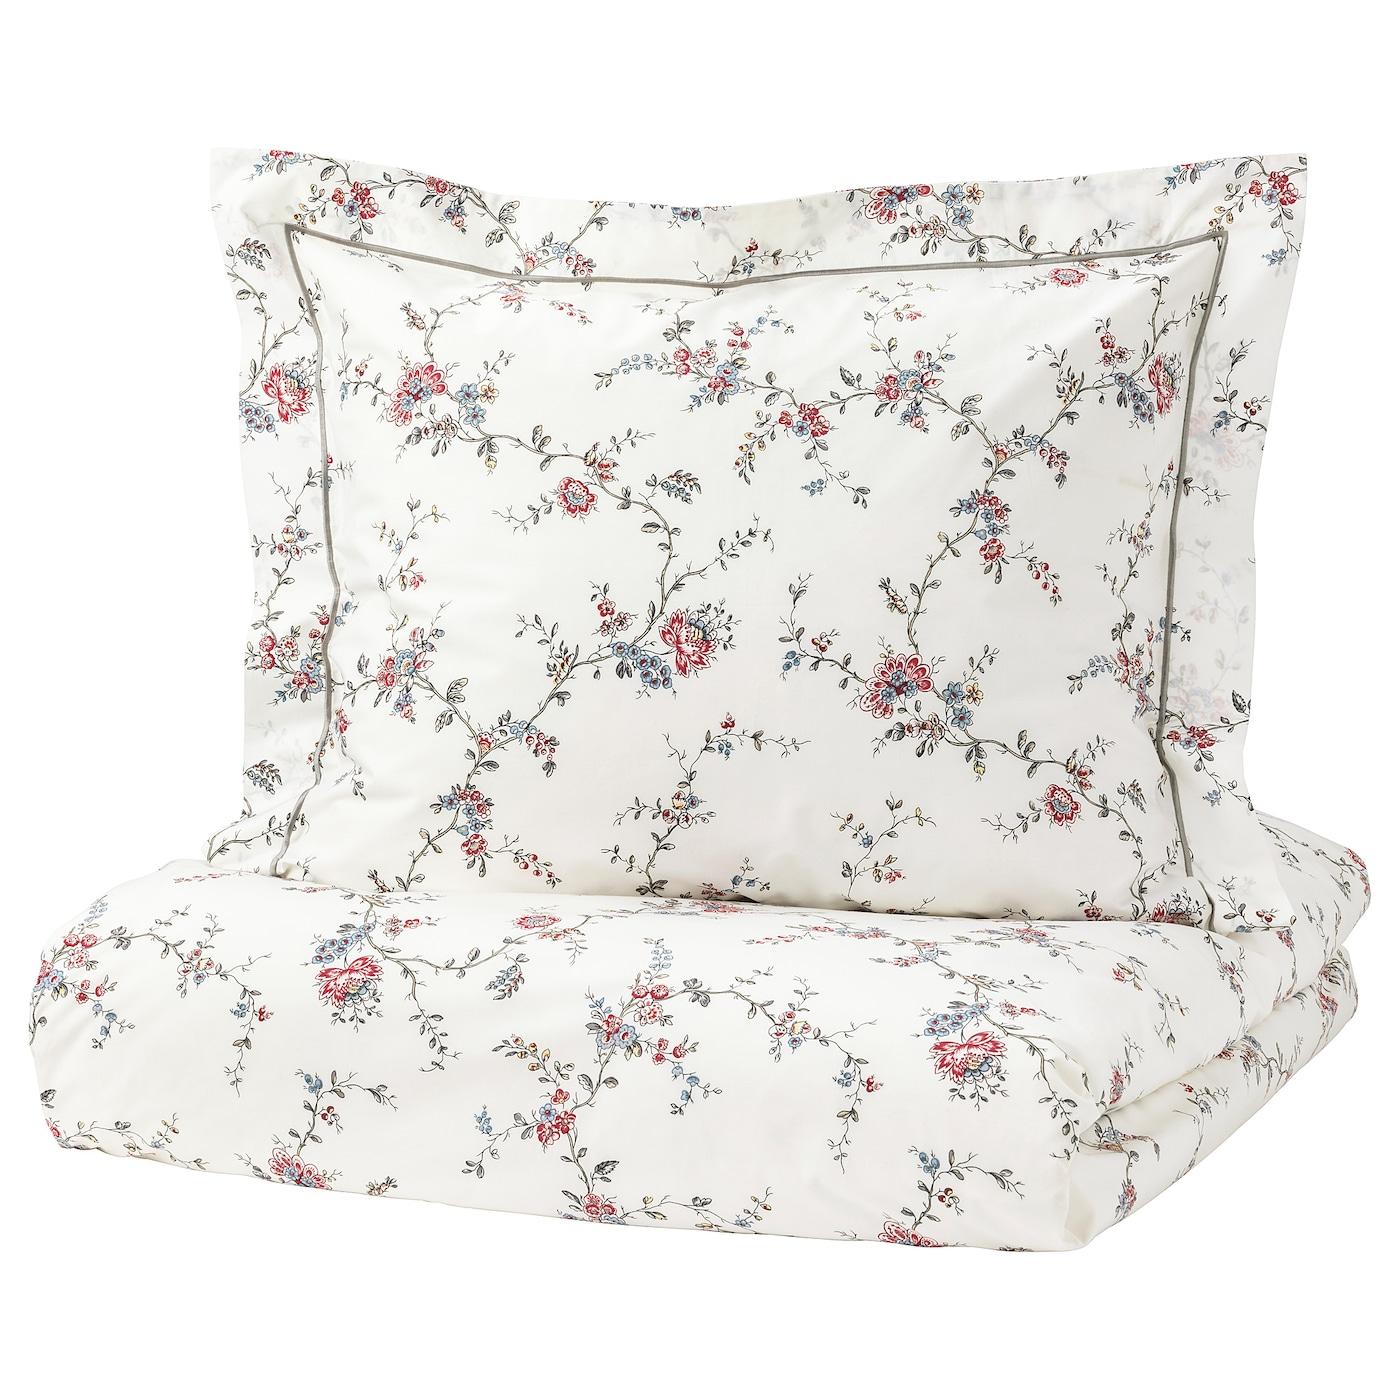 STENÖRT Funda nórd y funda para almohada Flor 150 x 200/50 x 60 cm